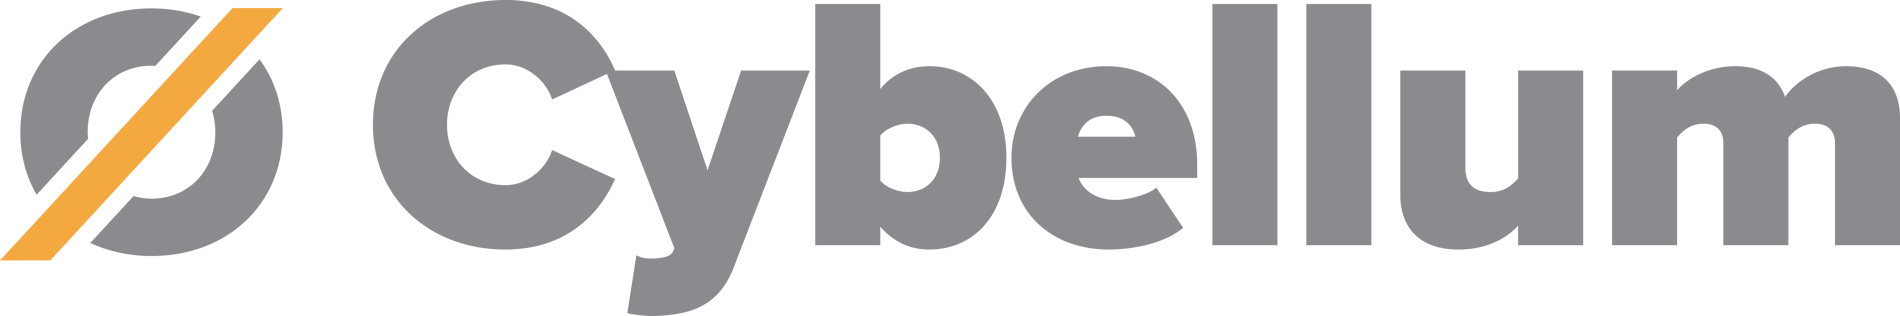 Cybellum logo